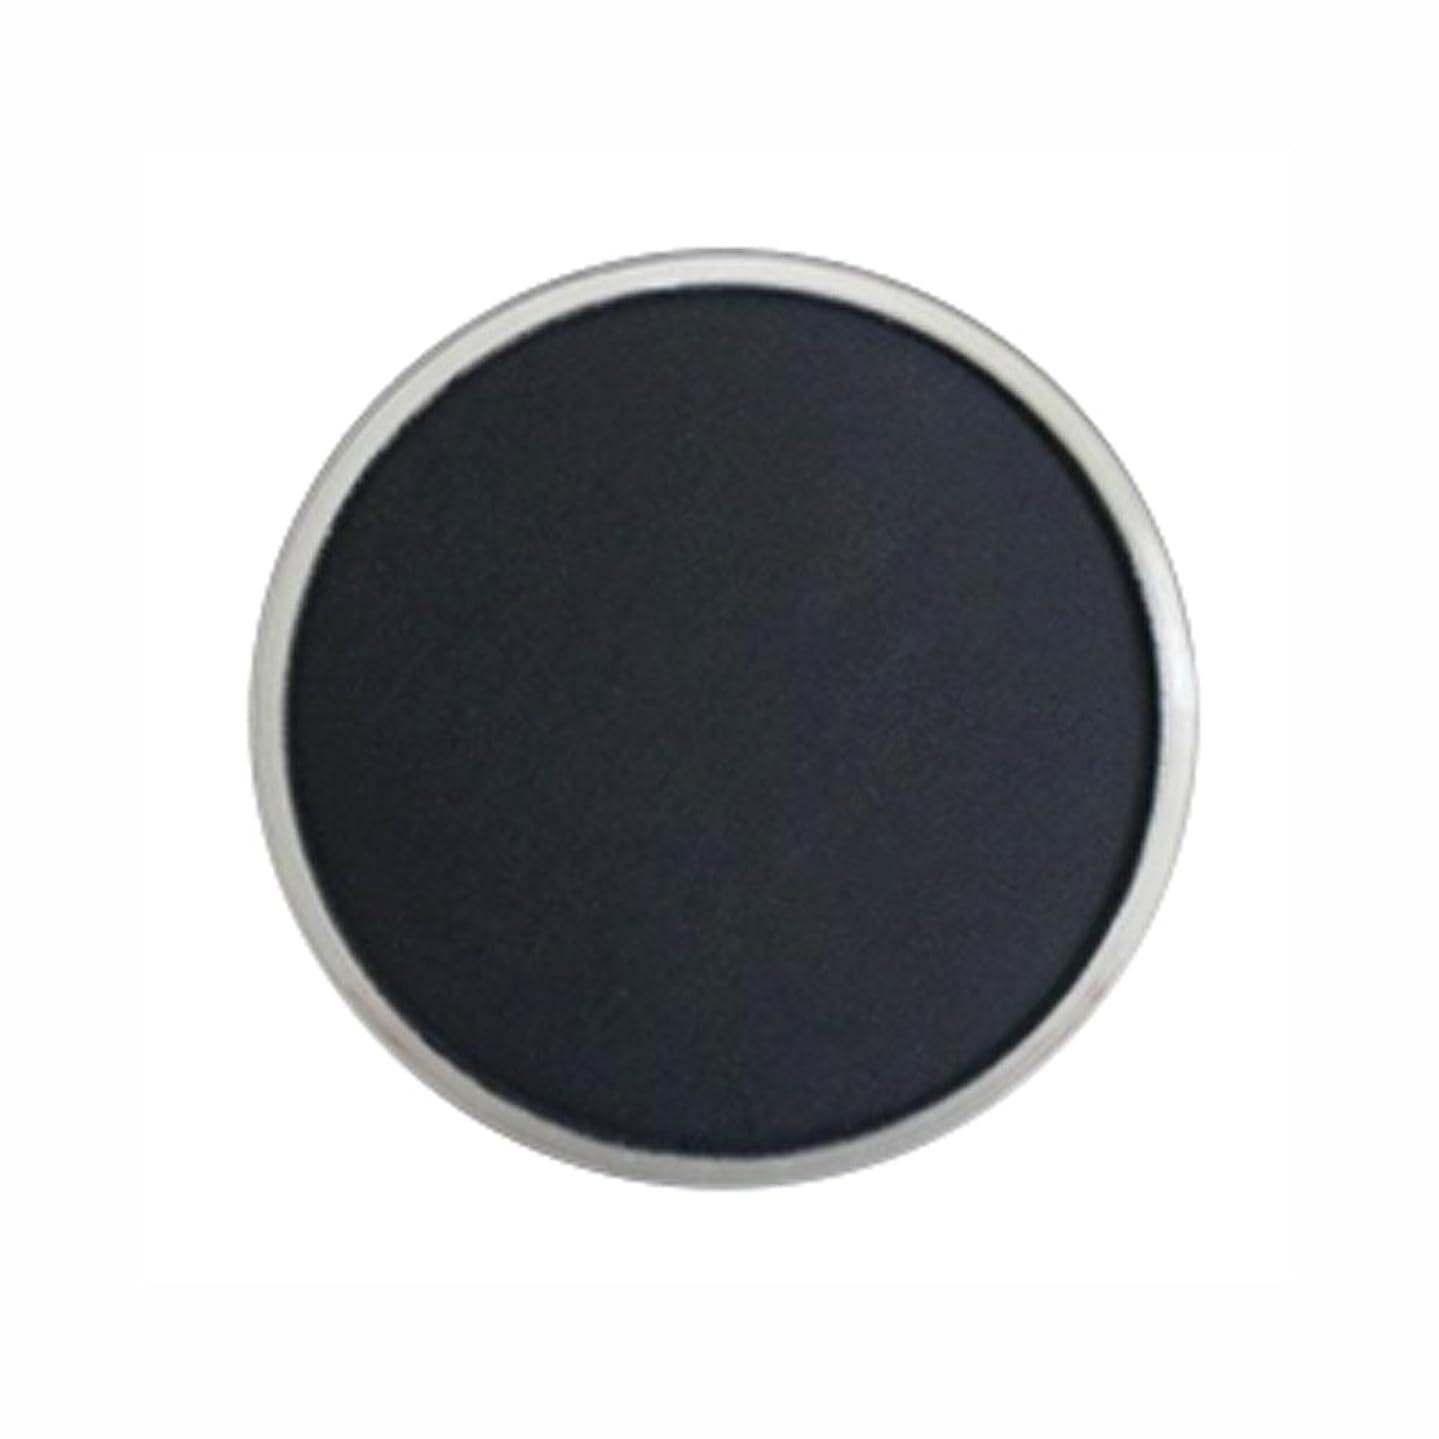 PanPastel Ultra Soft Artist Pastel, Paynes Grey Extra Dark